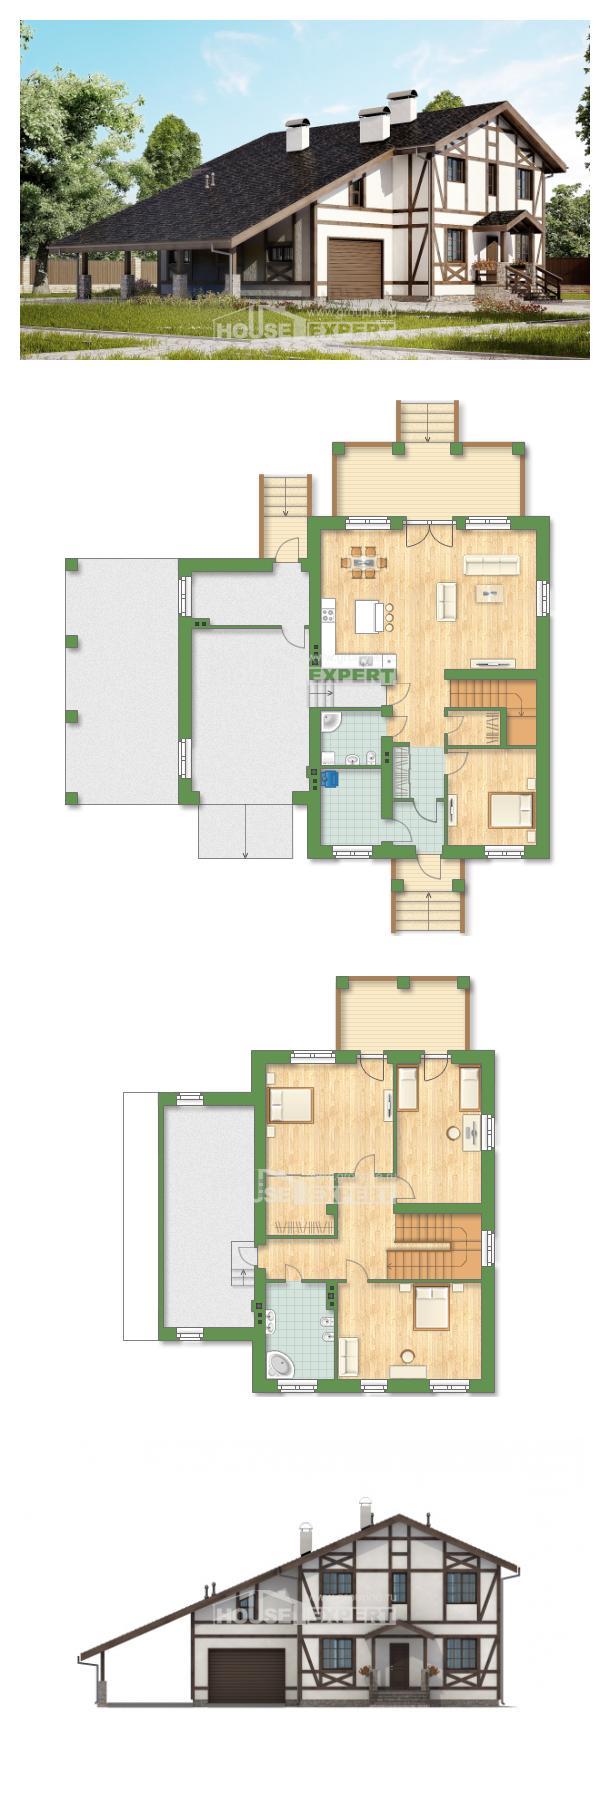 Projekt domu 250-002-L   House Expert